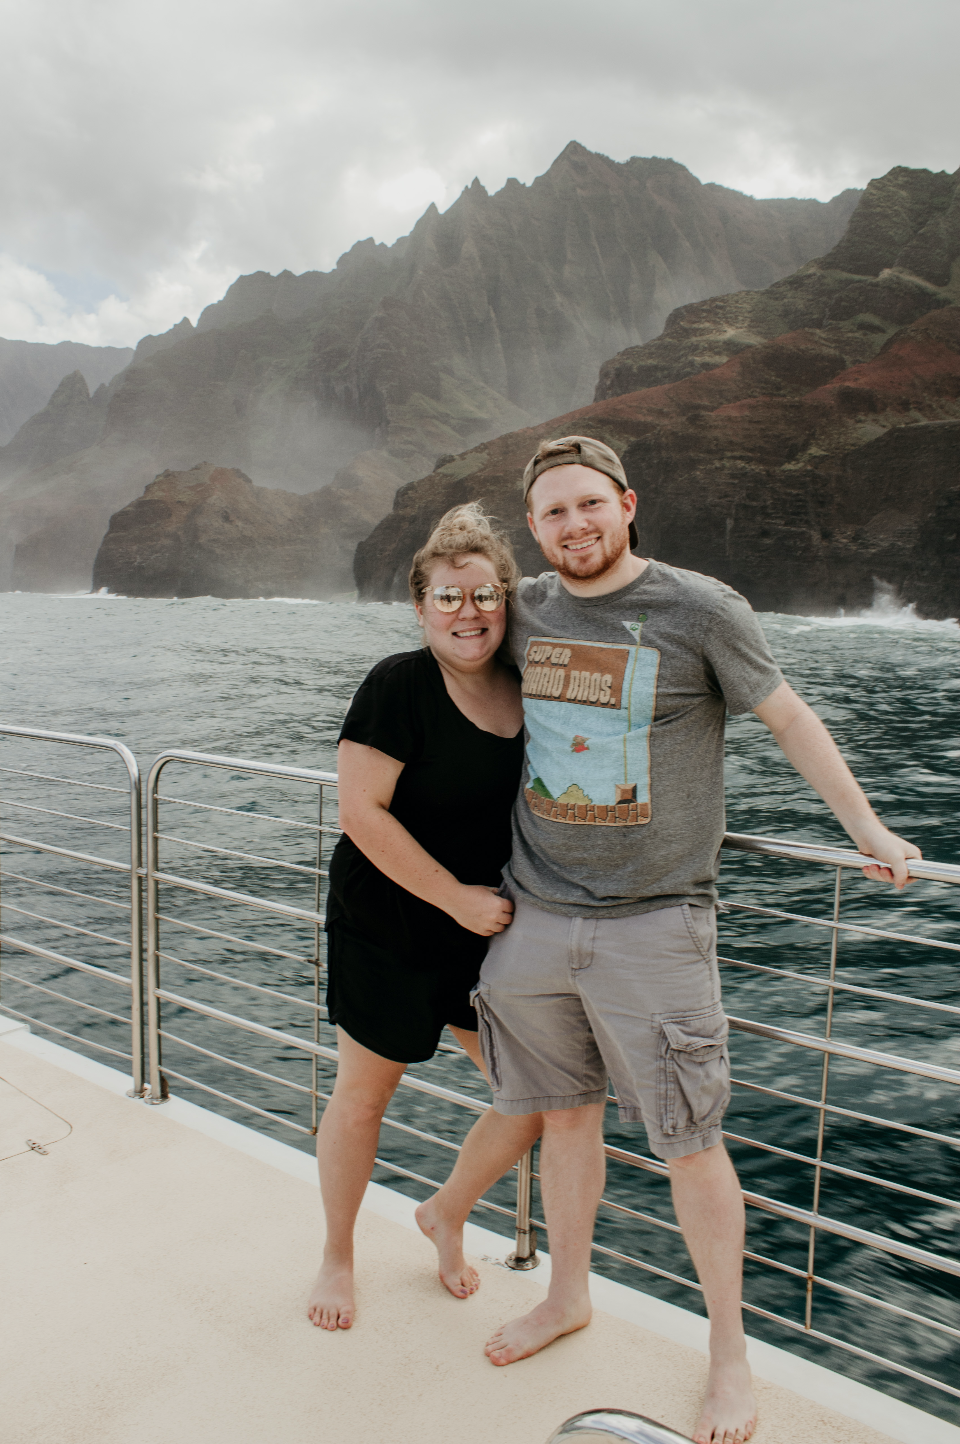 Hawaii Photographer - Adventurous Couples Photographer